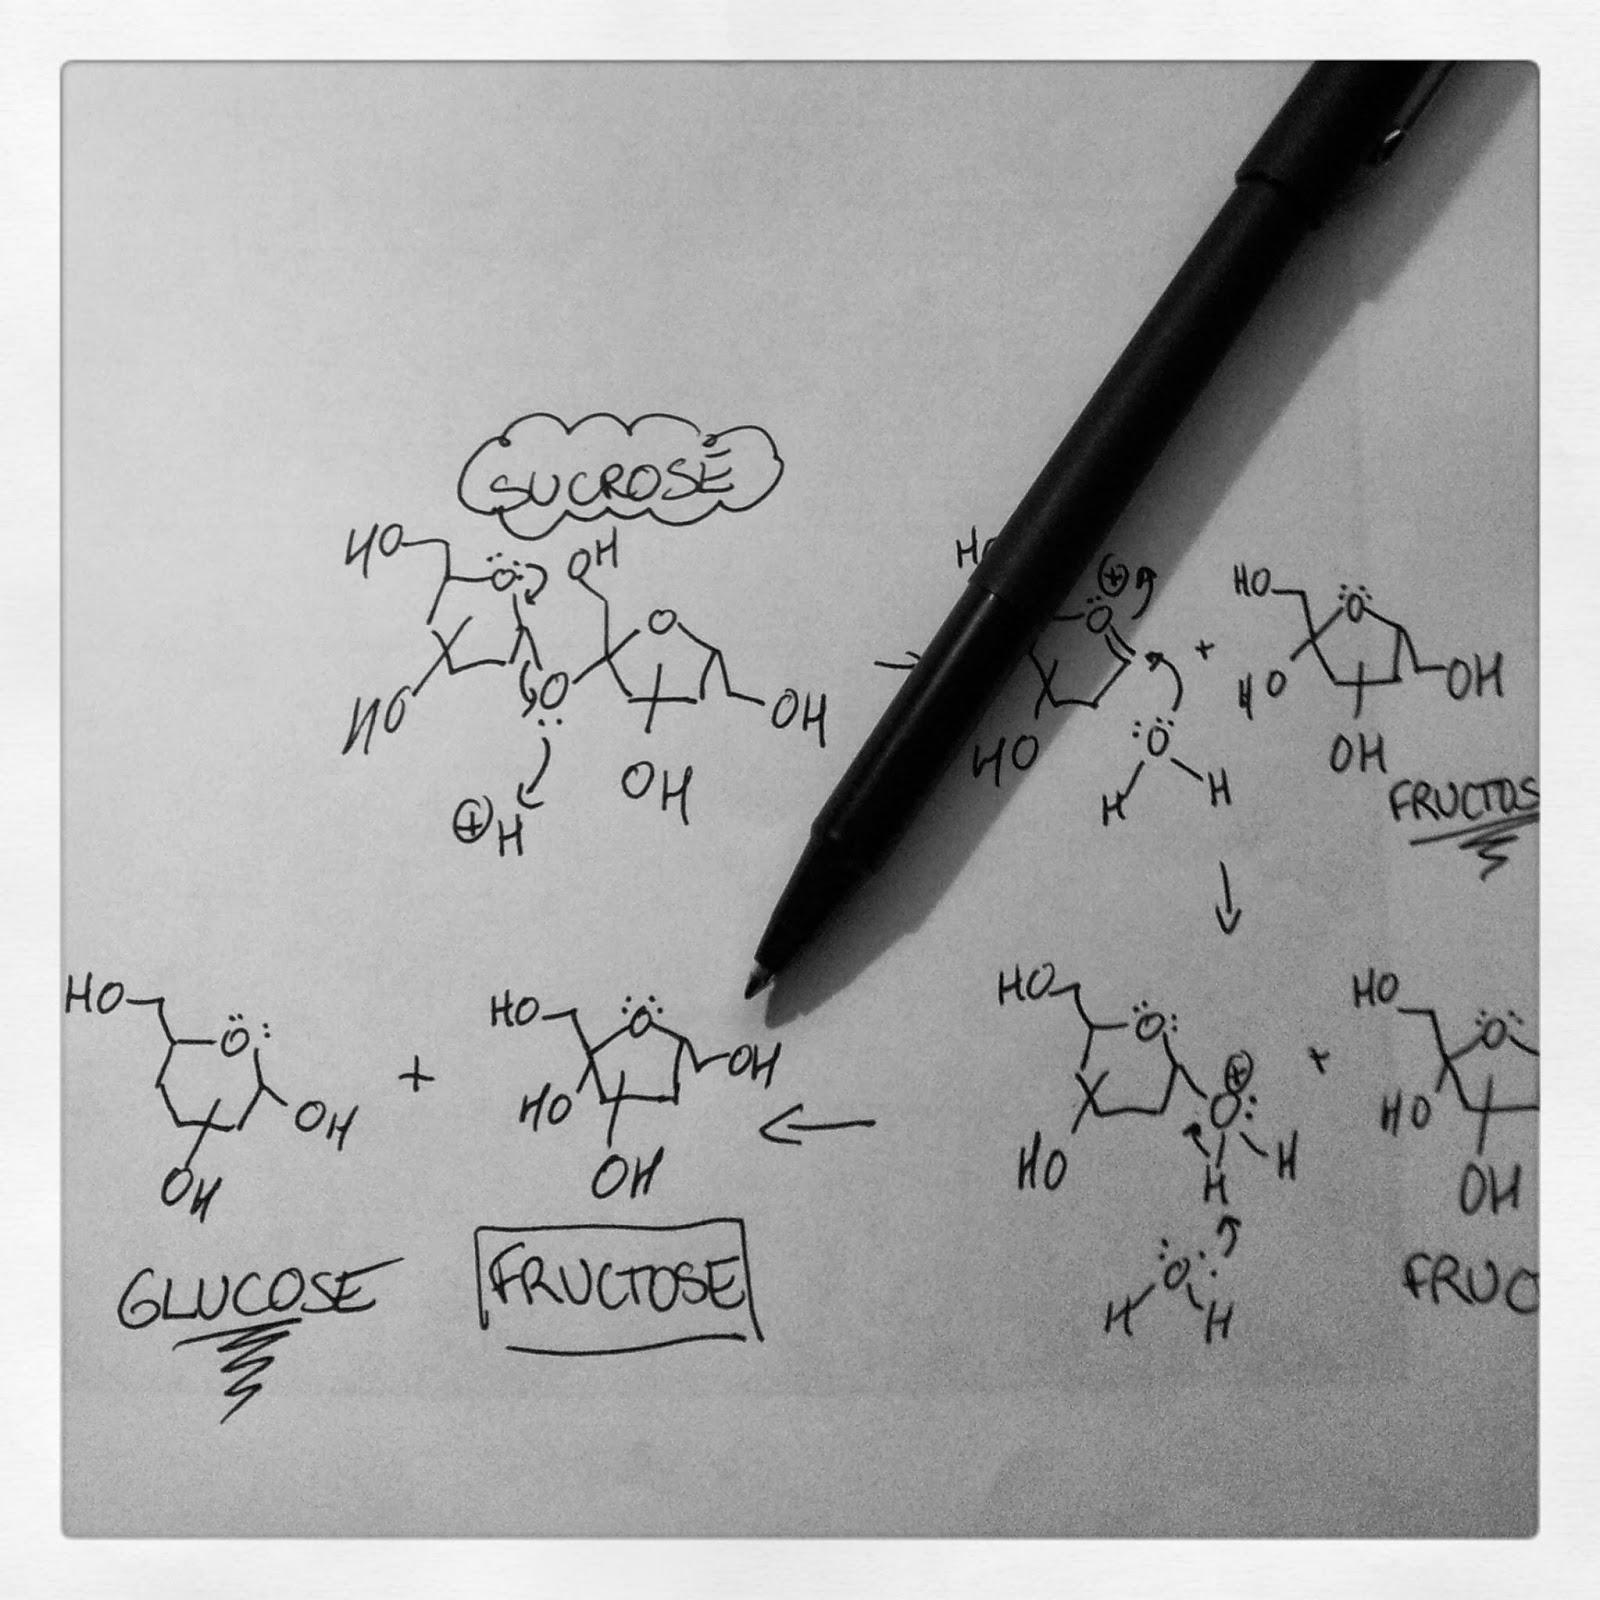 acid-catalyzed hydrolysis of sucrose   kitchen heals soul